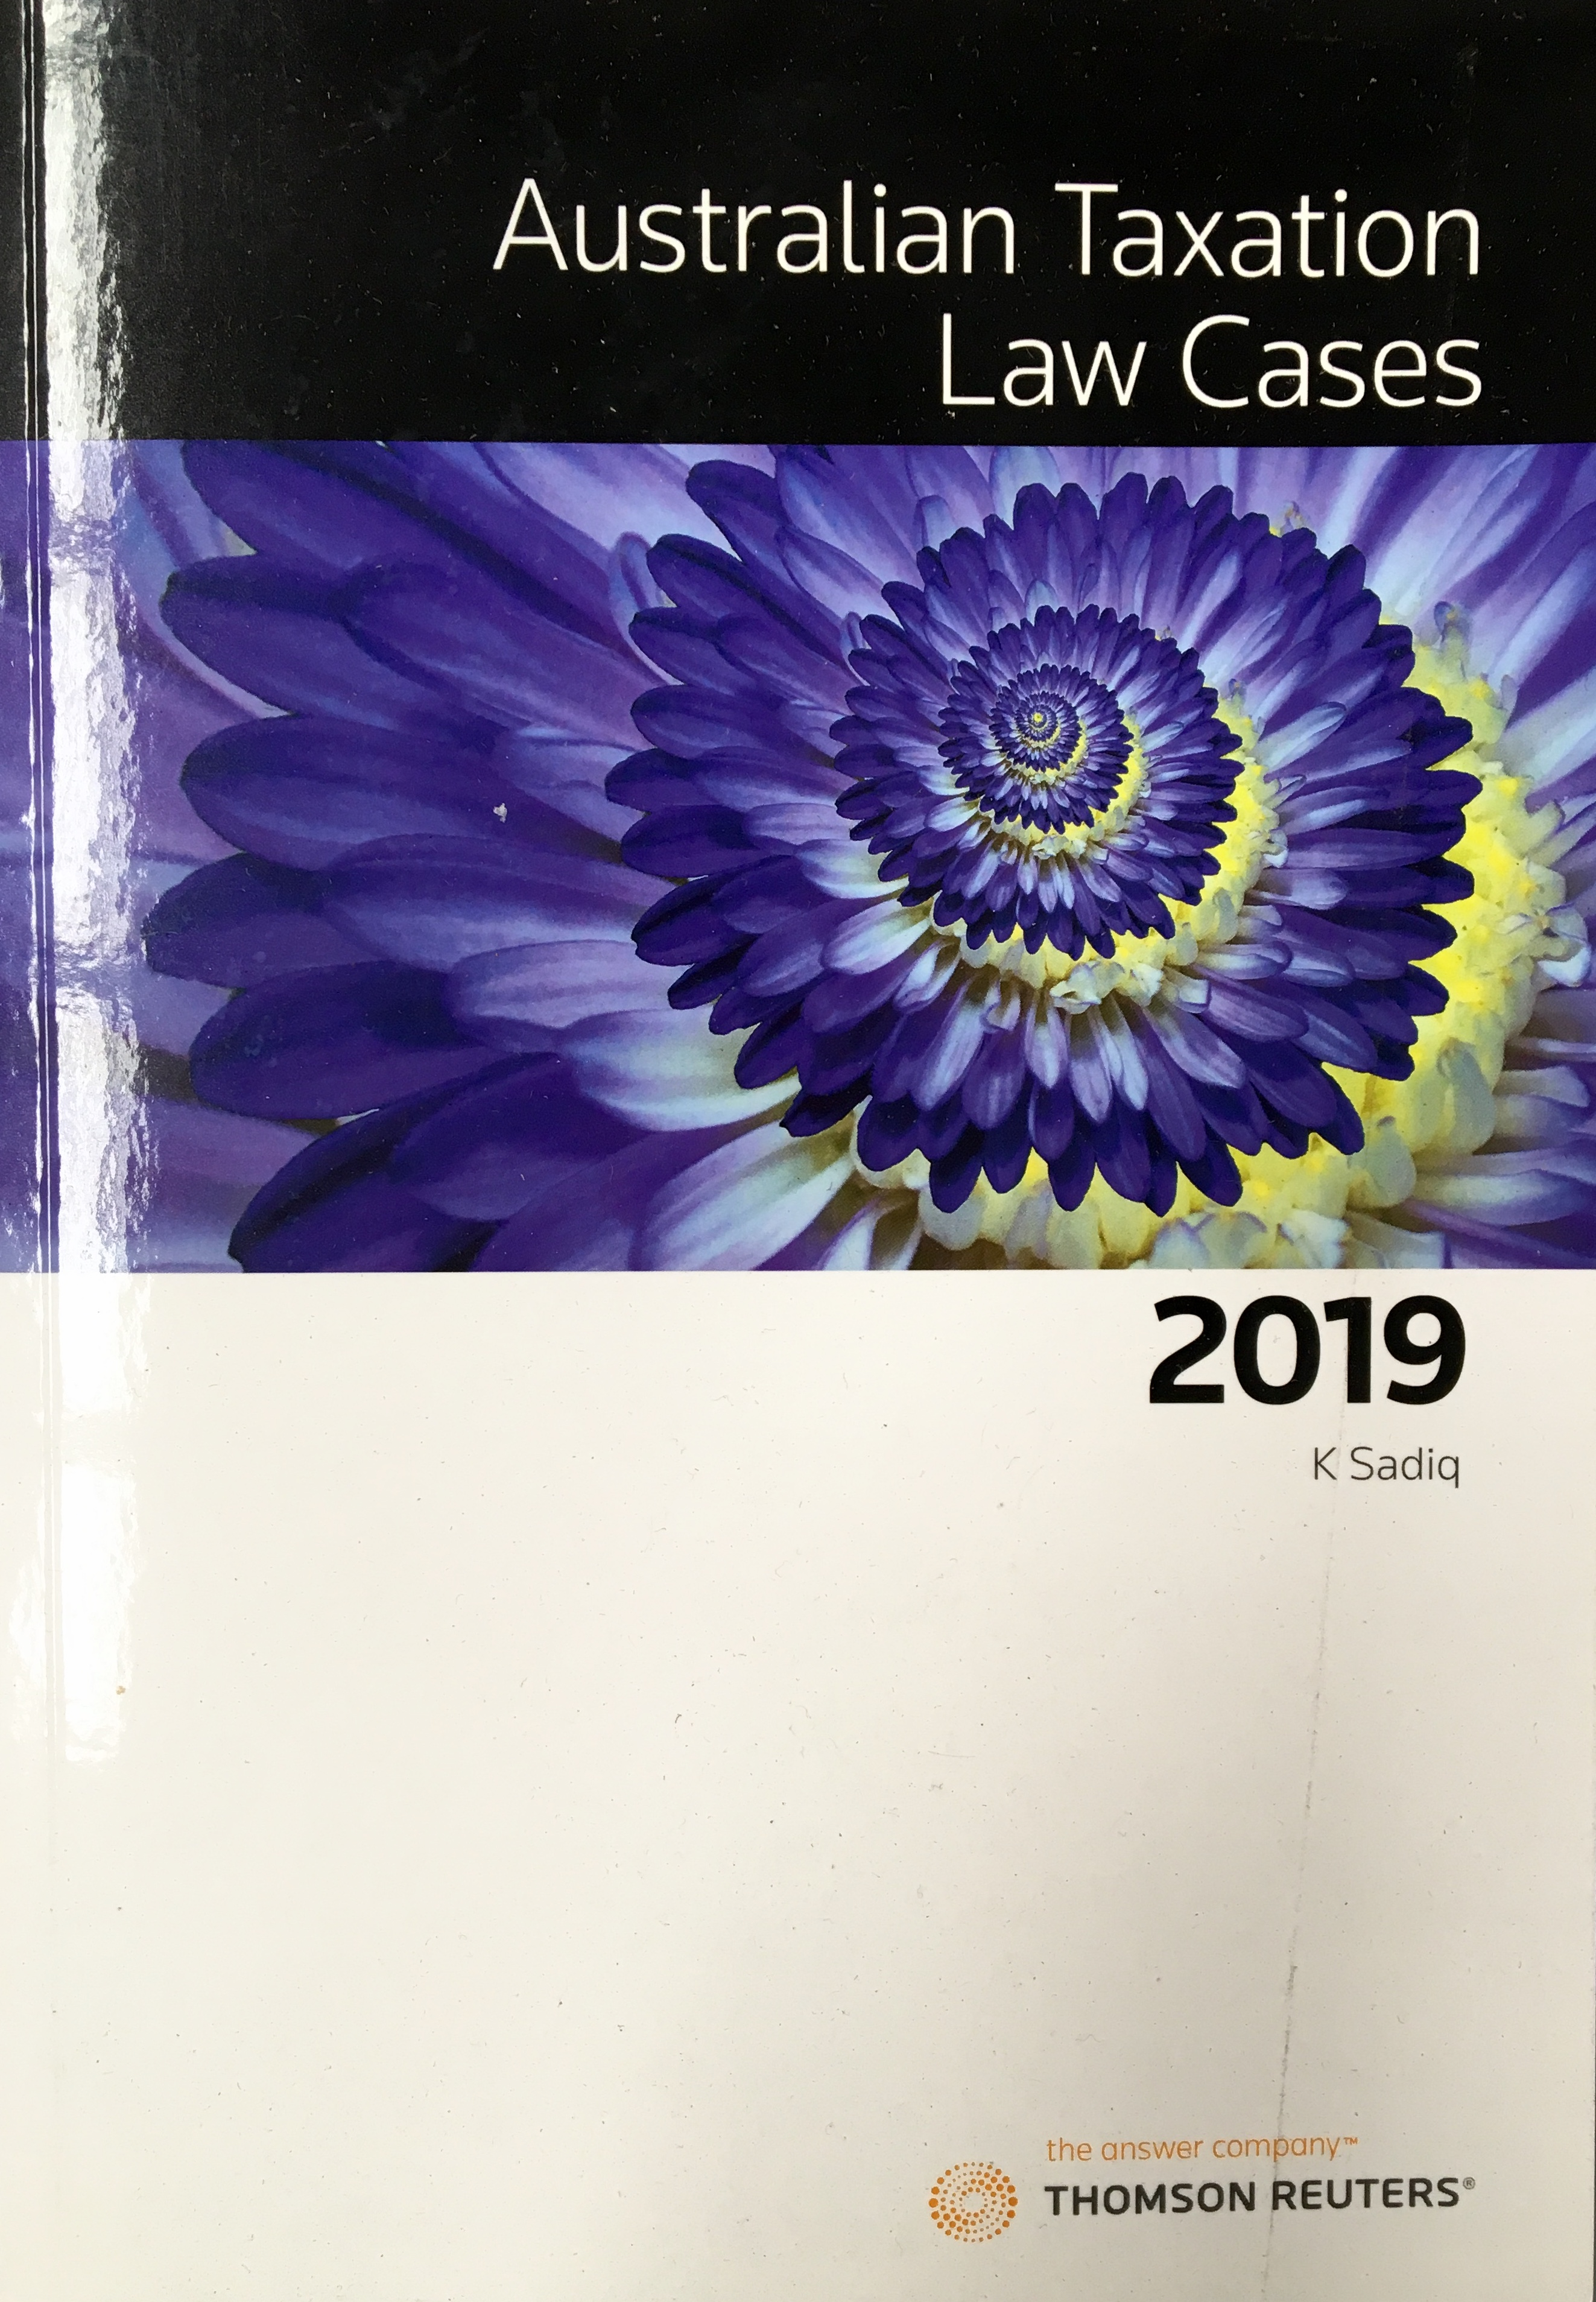 Australian Taxation Law Cases 2019